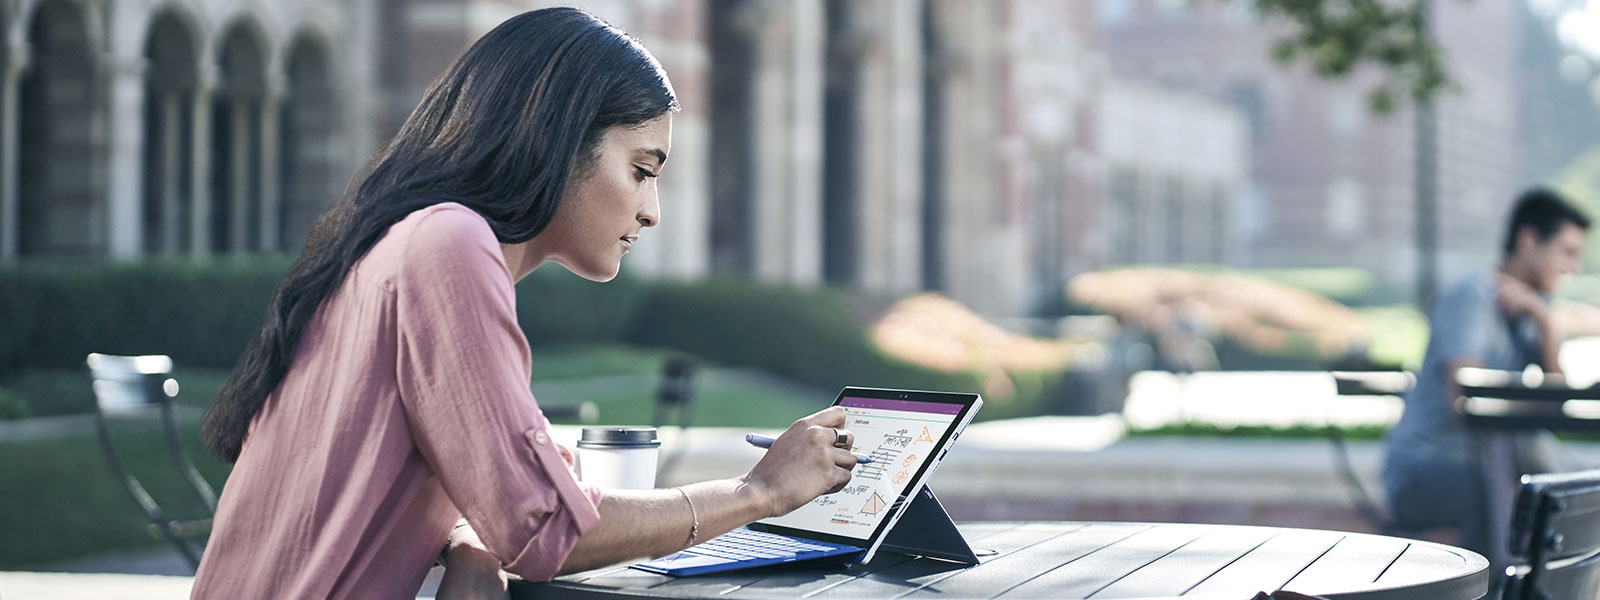 Surface 펜으로 Surface Studio 스크린 위에 그림을 그리면서 다른 손으로는 화면을 확대/축소하고 있는 여자